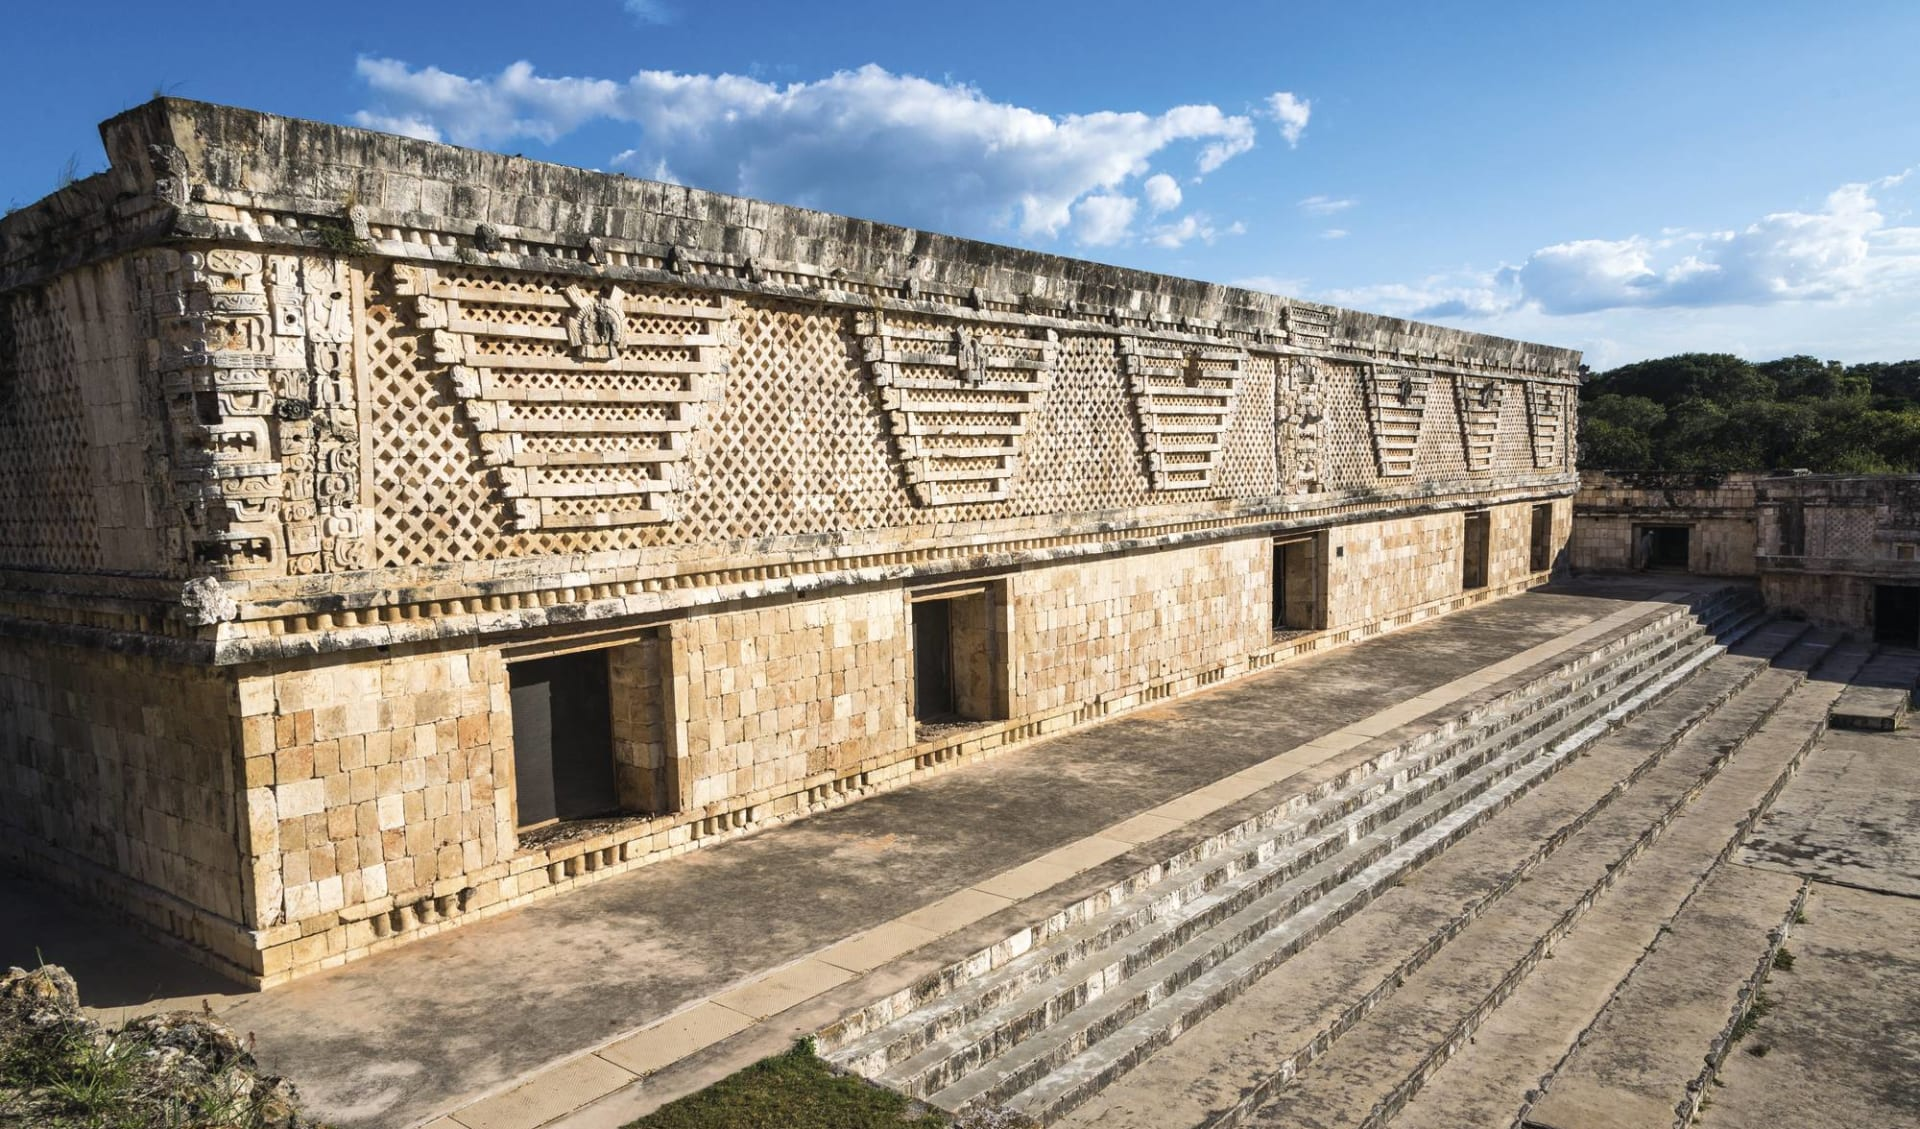 Höhepunkte Yucatán ab Cancun: Mexico - Yucatan - Ruinen von Uxmal